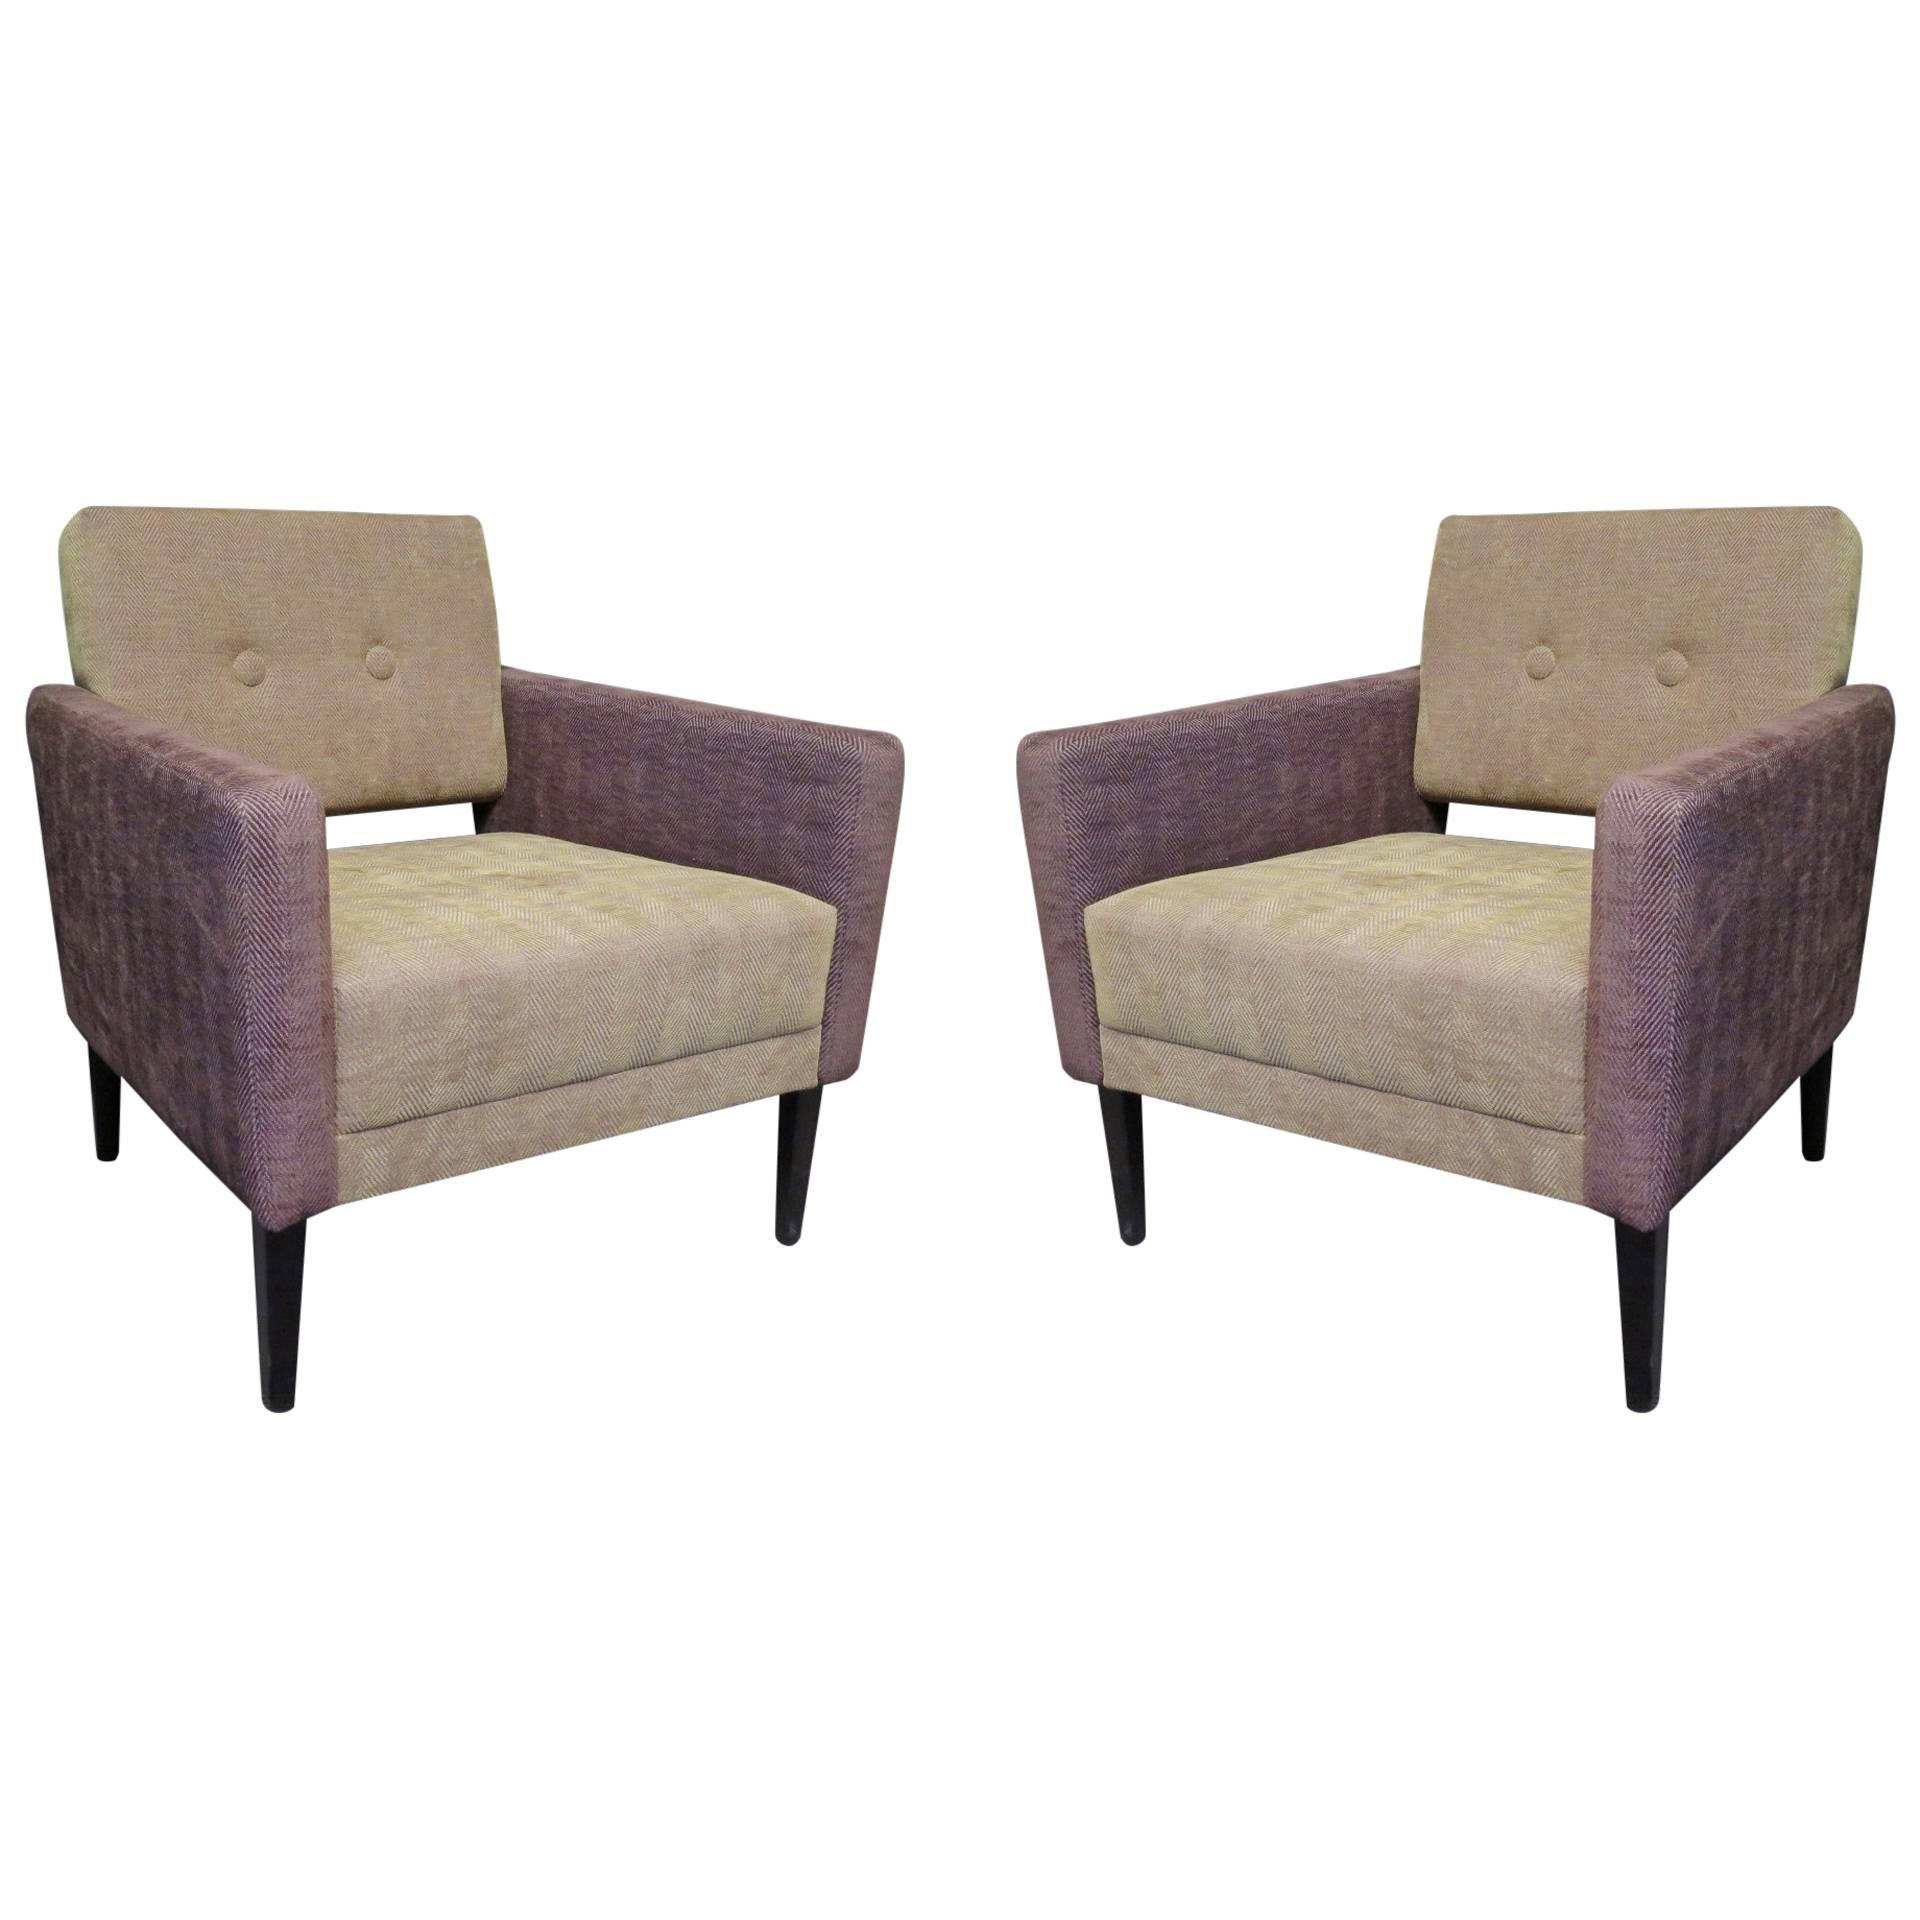 Pair of Midcentury Green and Purple Velvet Armchairs, 1950